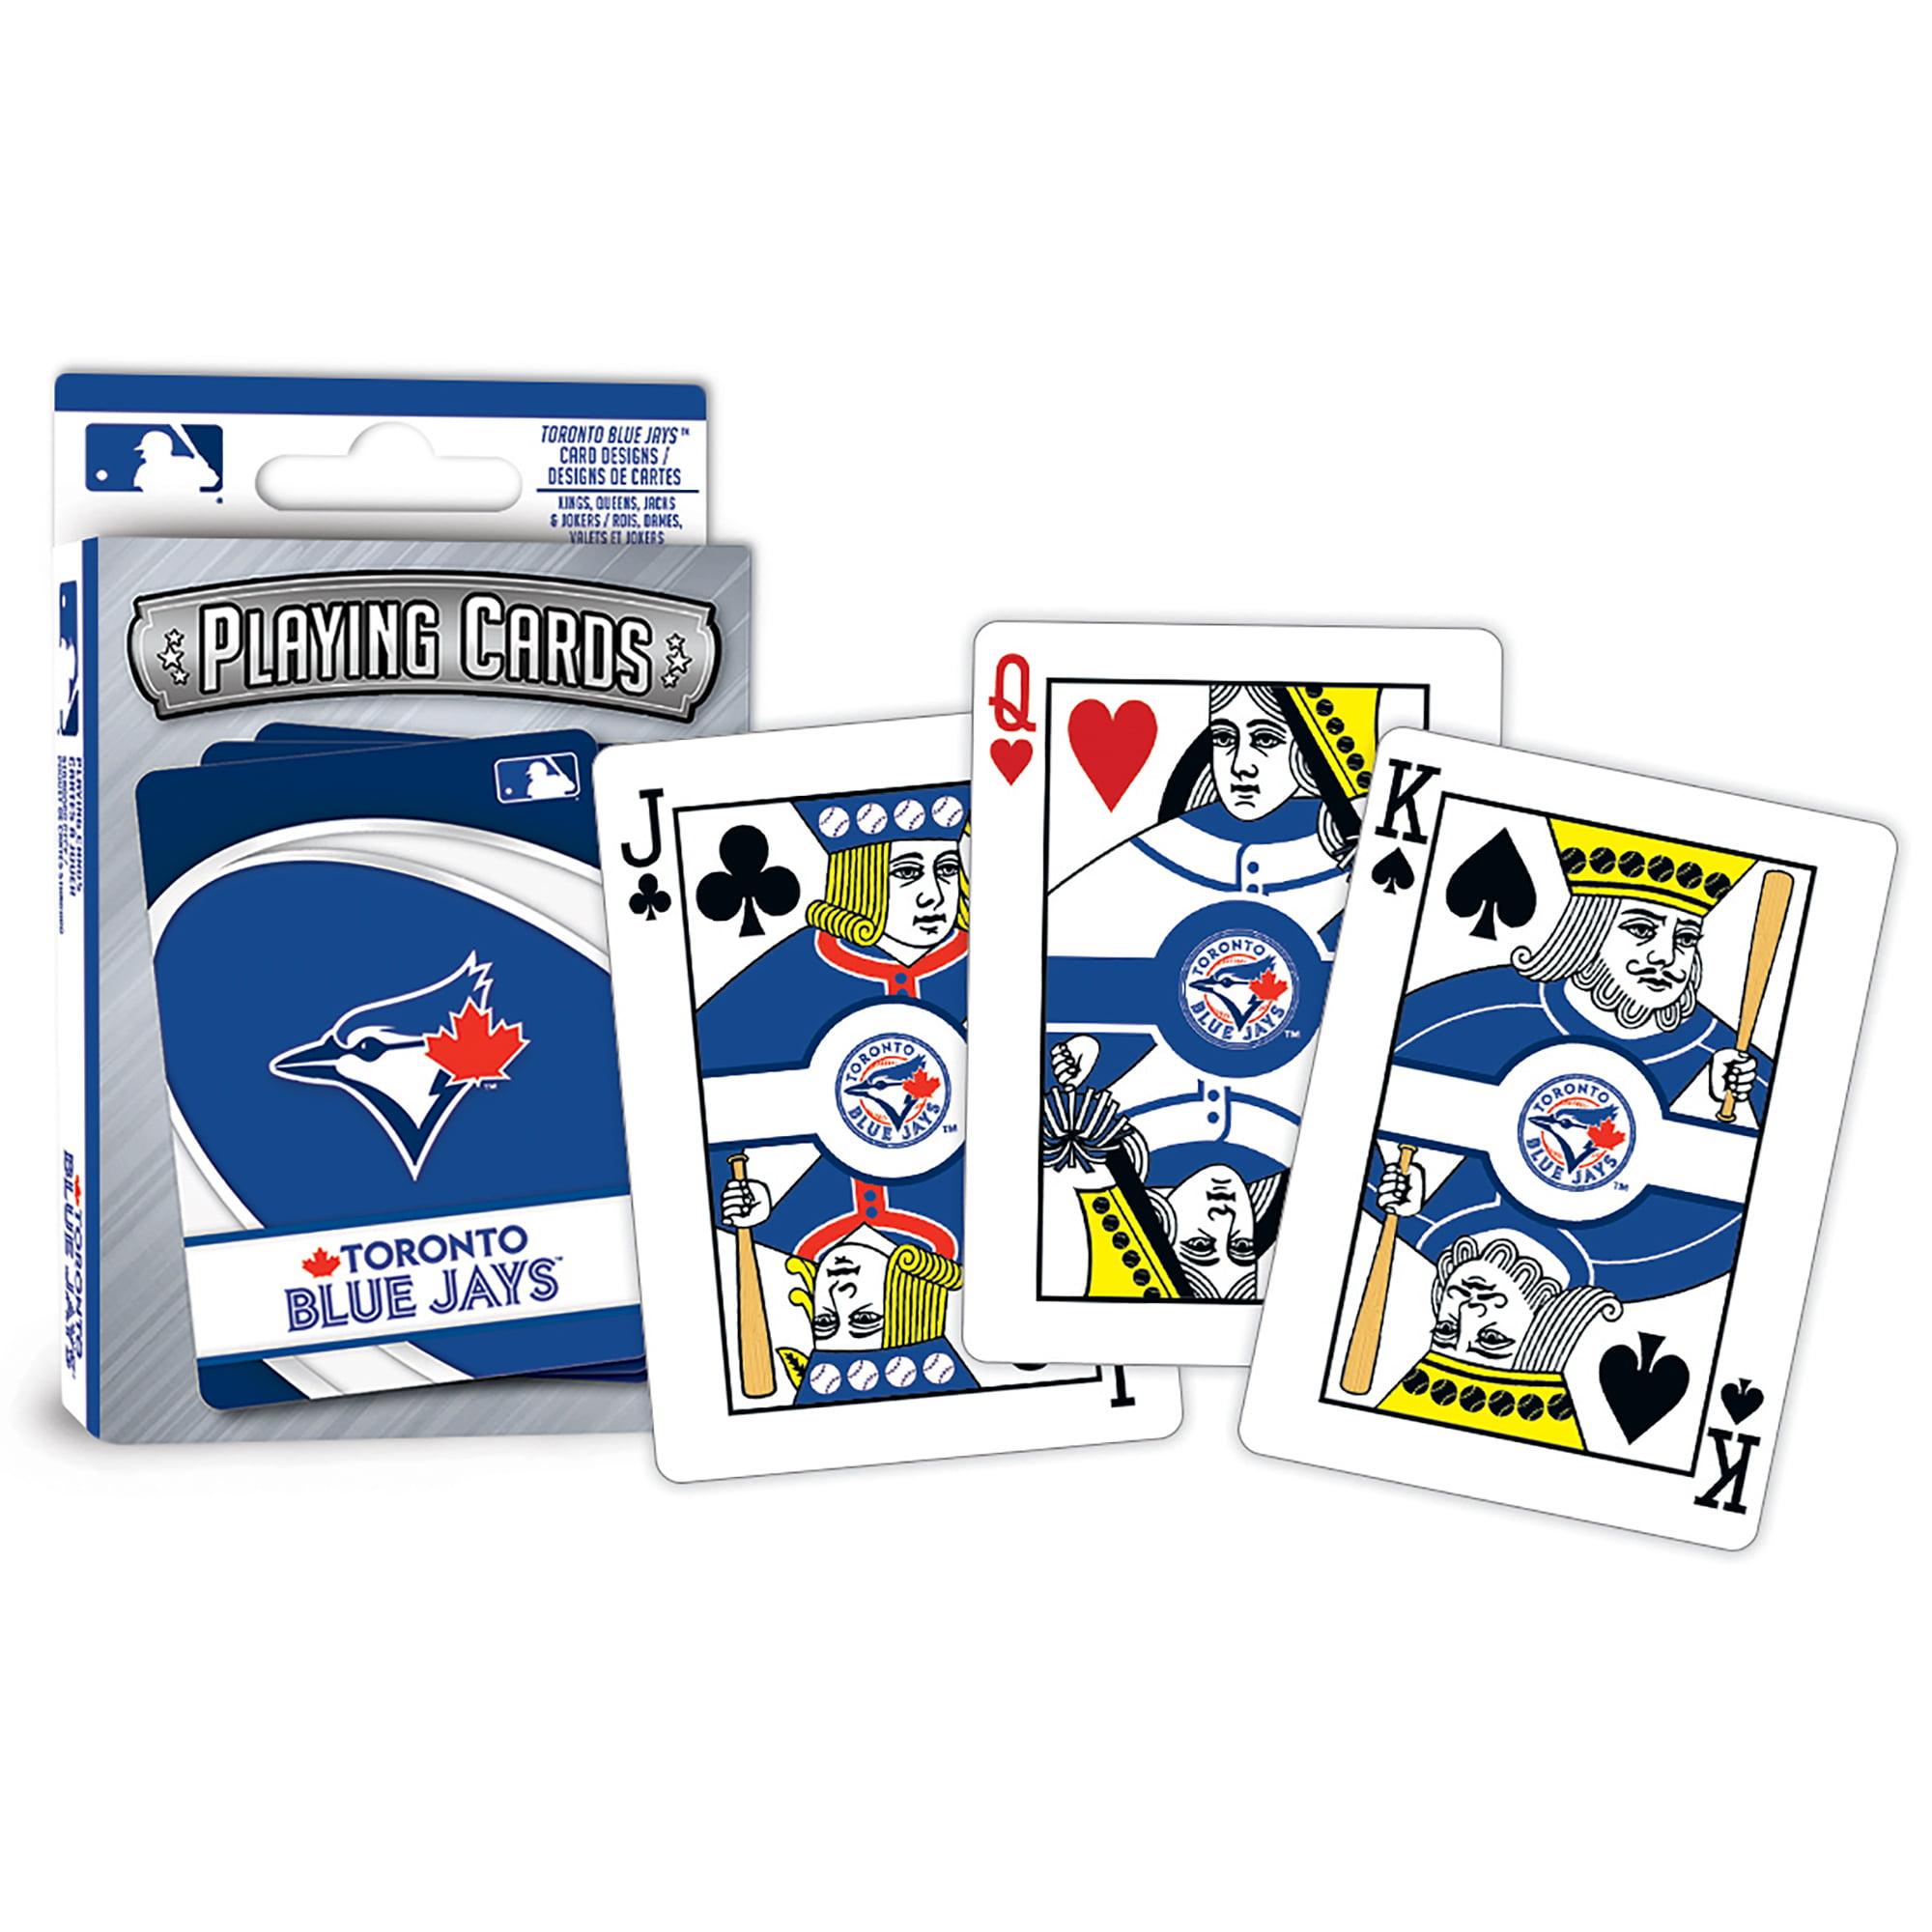 Toronto Blue Jays Playing Cards - No Size